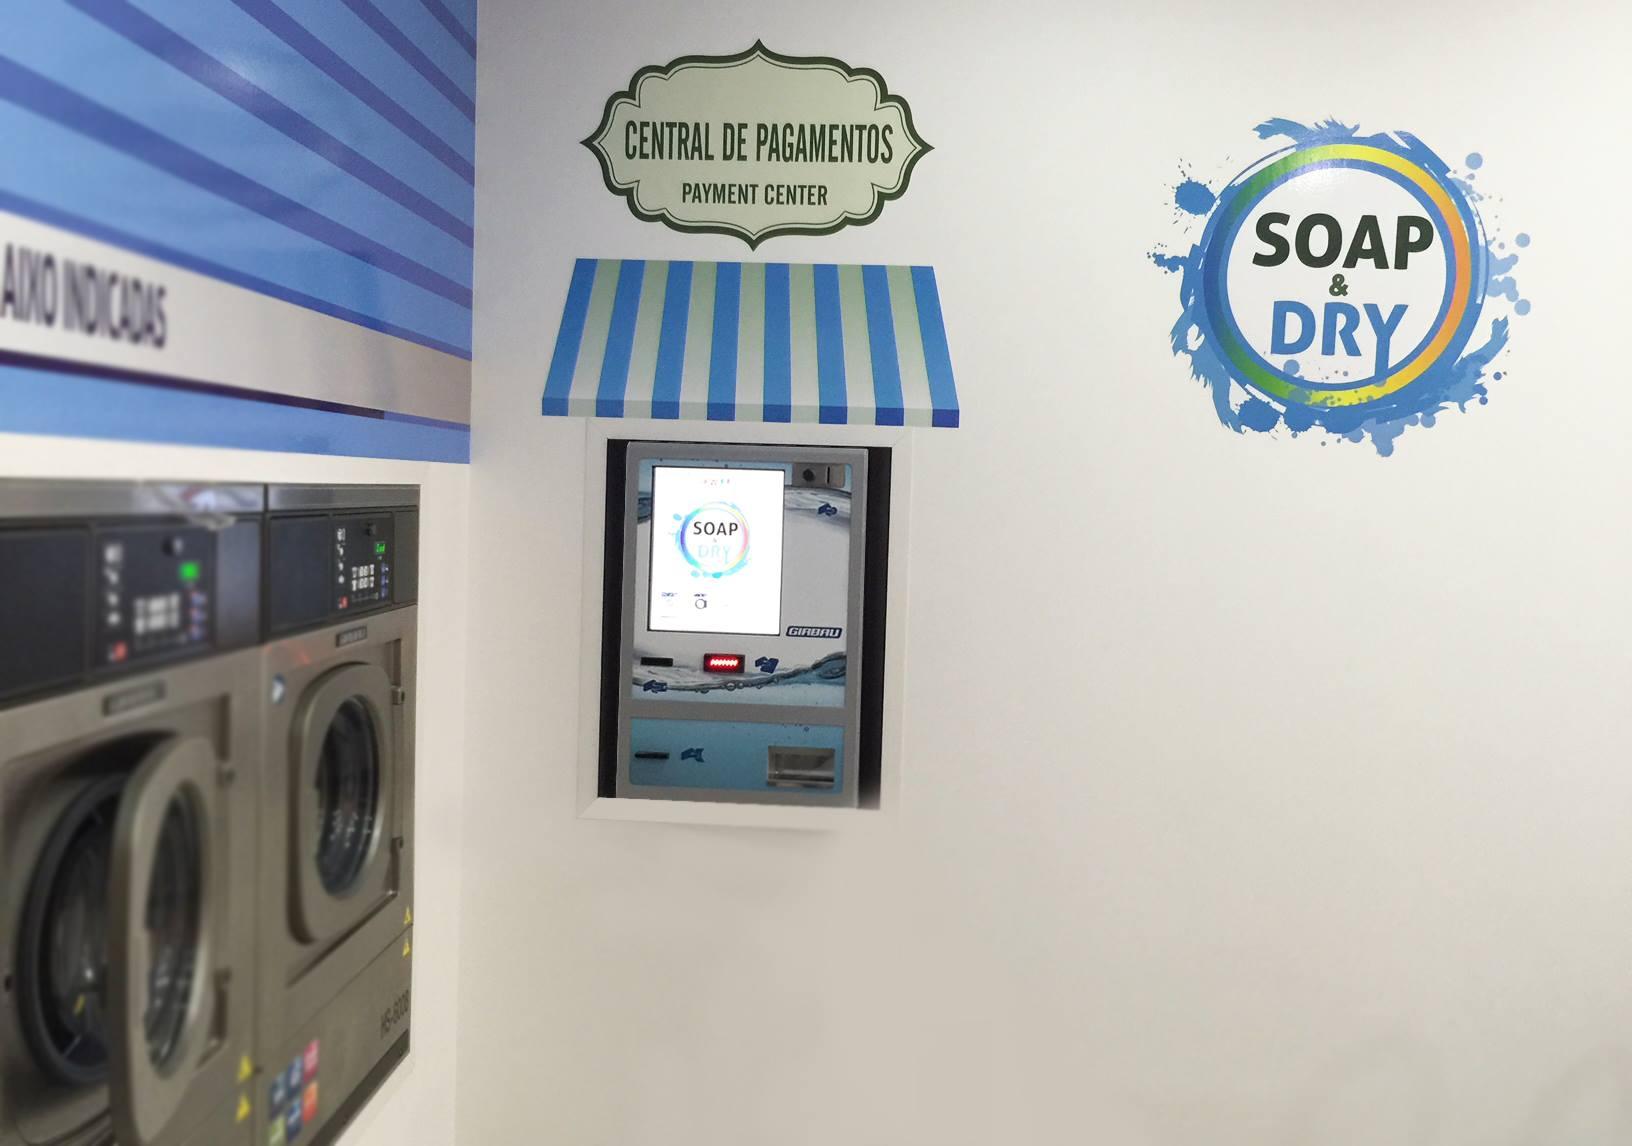 Soap & Dry Central de Pagamentos